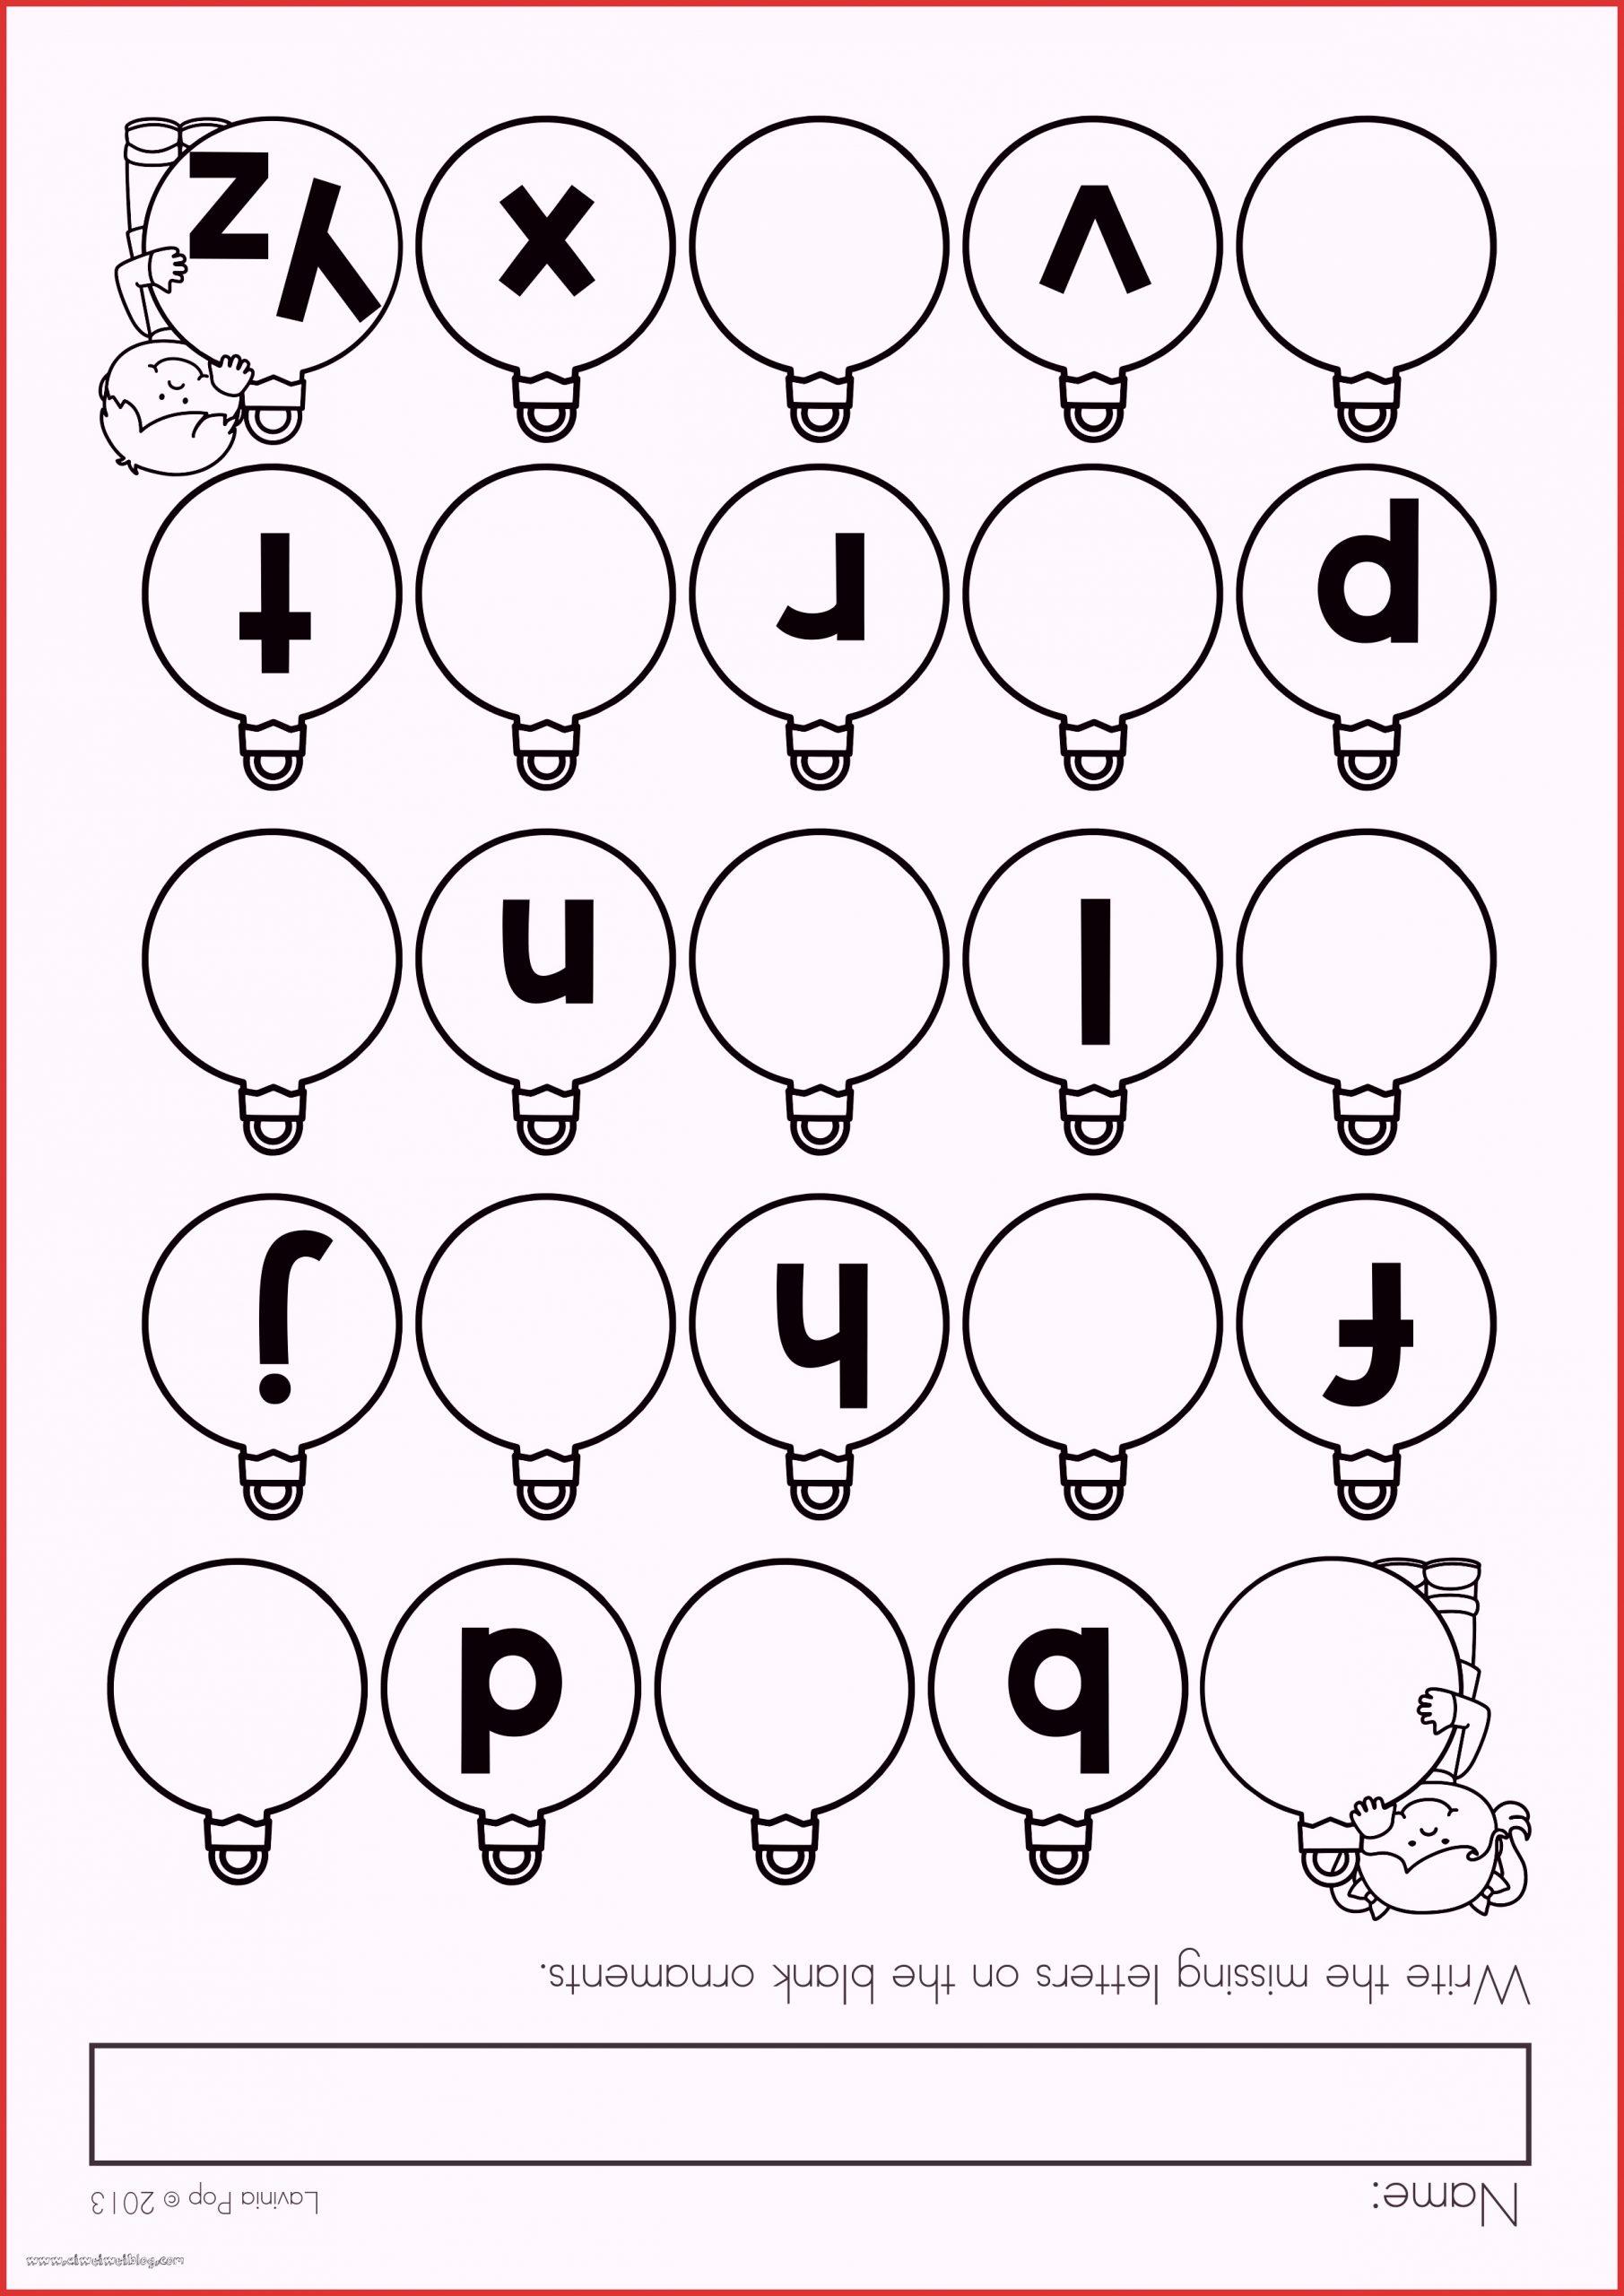 Christmas Worksheets Ideas for Preschoolers Beautiful 3 Best Preschool Christmas Worksheets Images On Best